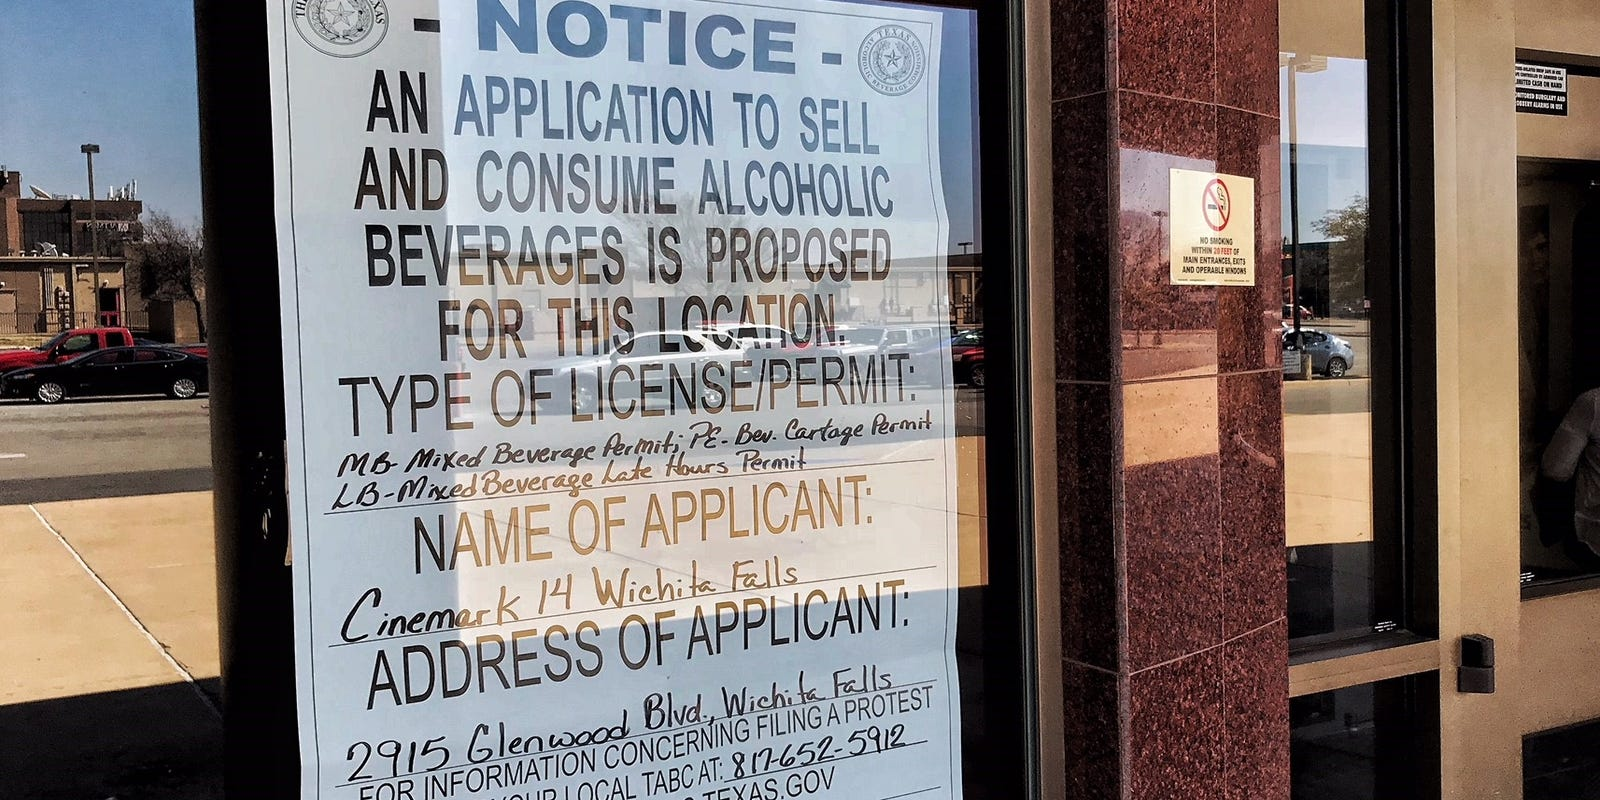 Wichita Falls Cinemark Seeks Permit To Sell Beer Wine Mixed Drinks